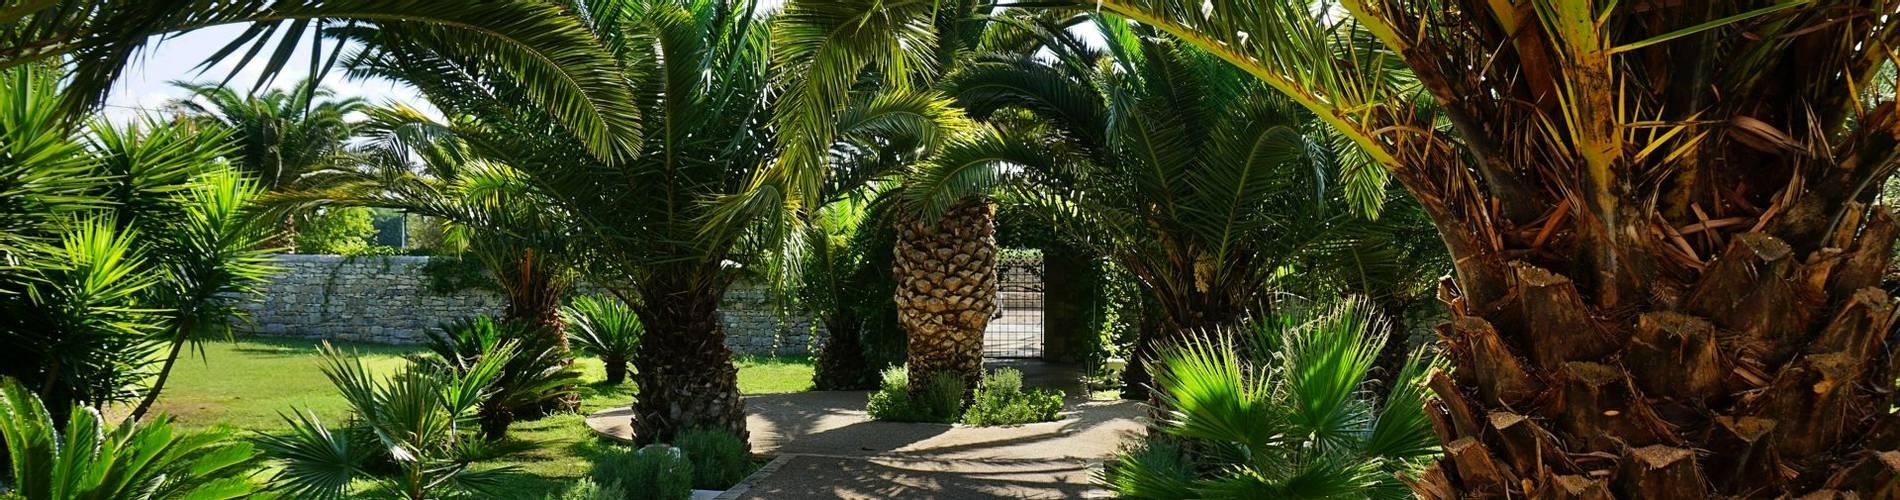 Cambiocavallo, Sicily, Italy (13).jpg